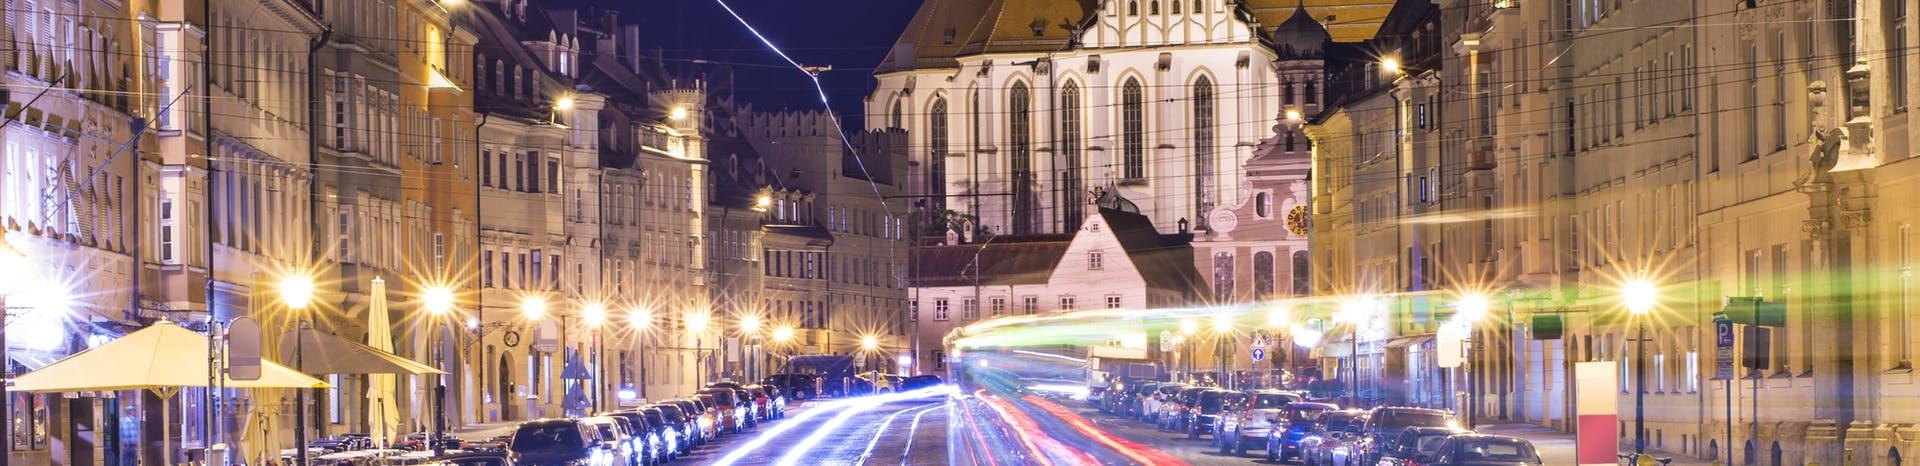 Picture of Augsburg